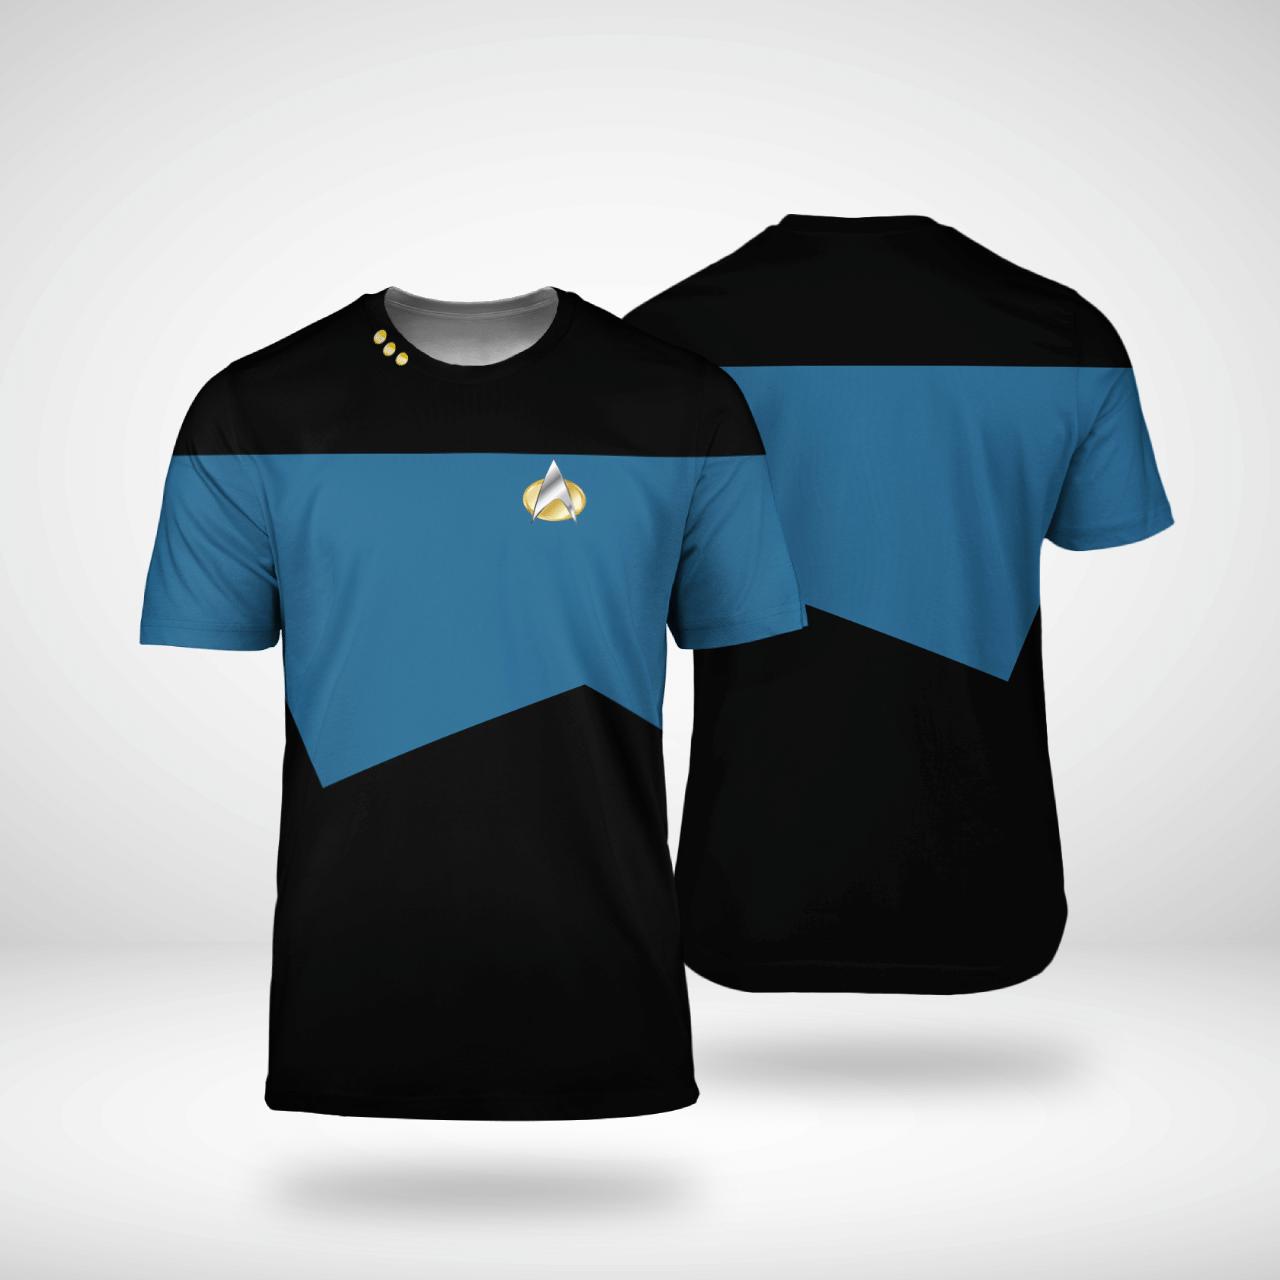 Star Trek science 3d shirt - LIMITED EDITION